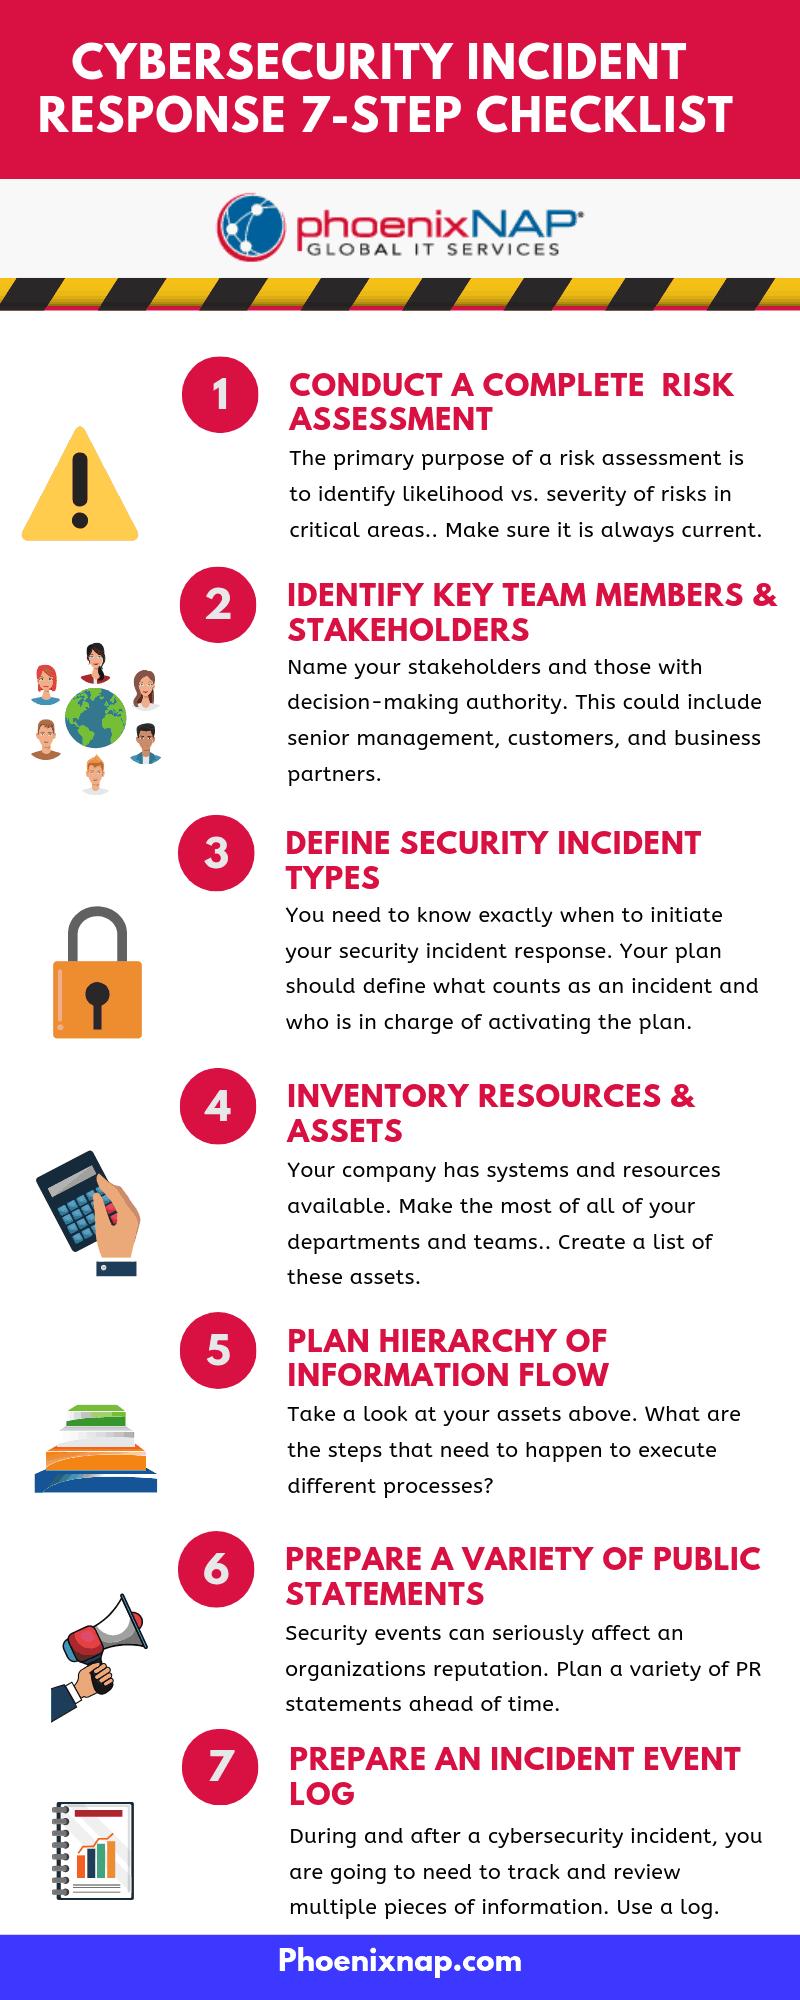 CSIRT checklist in infographic form